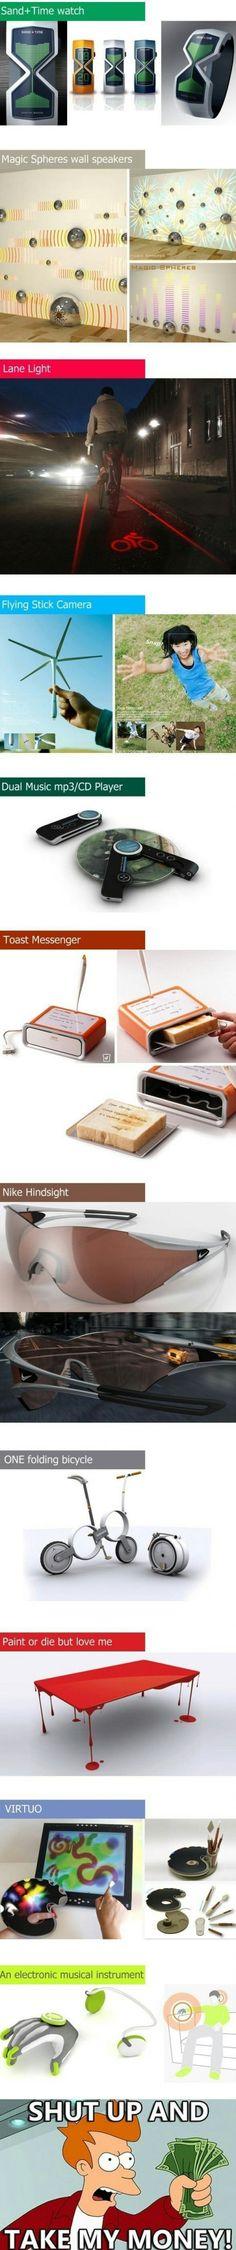 11 genius modern inventions